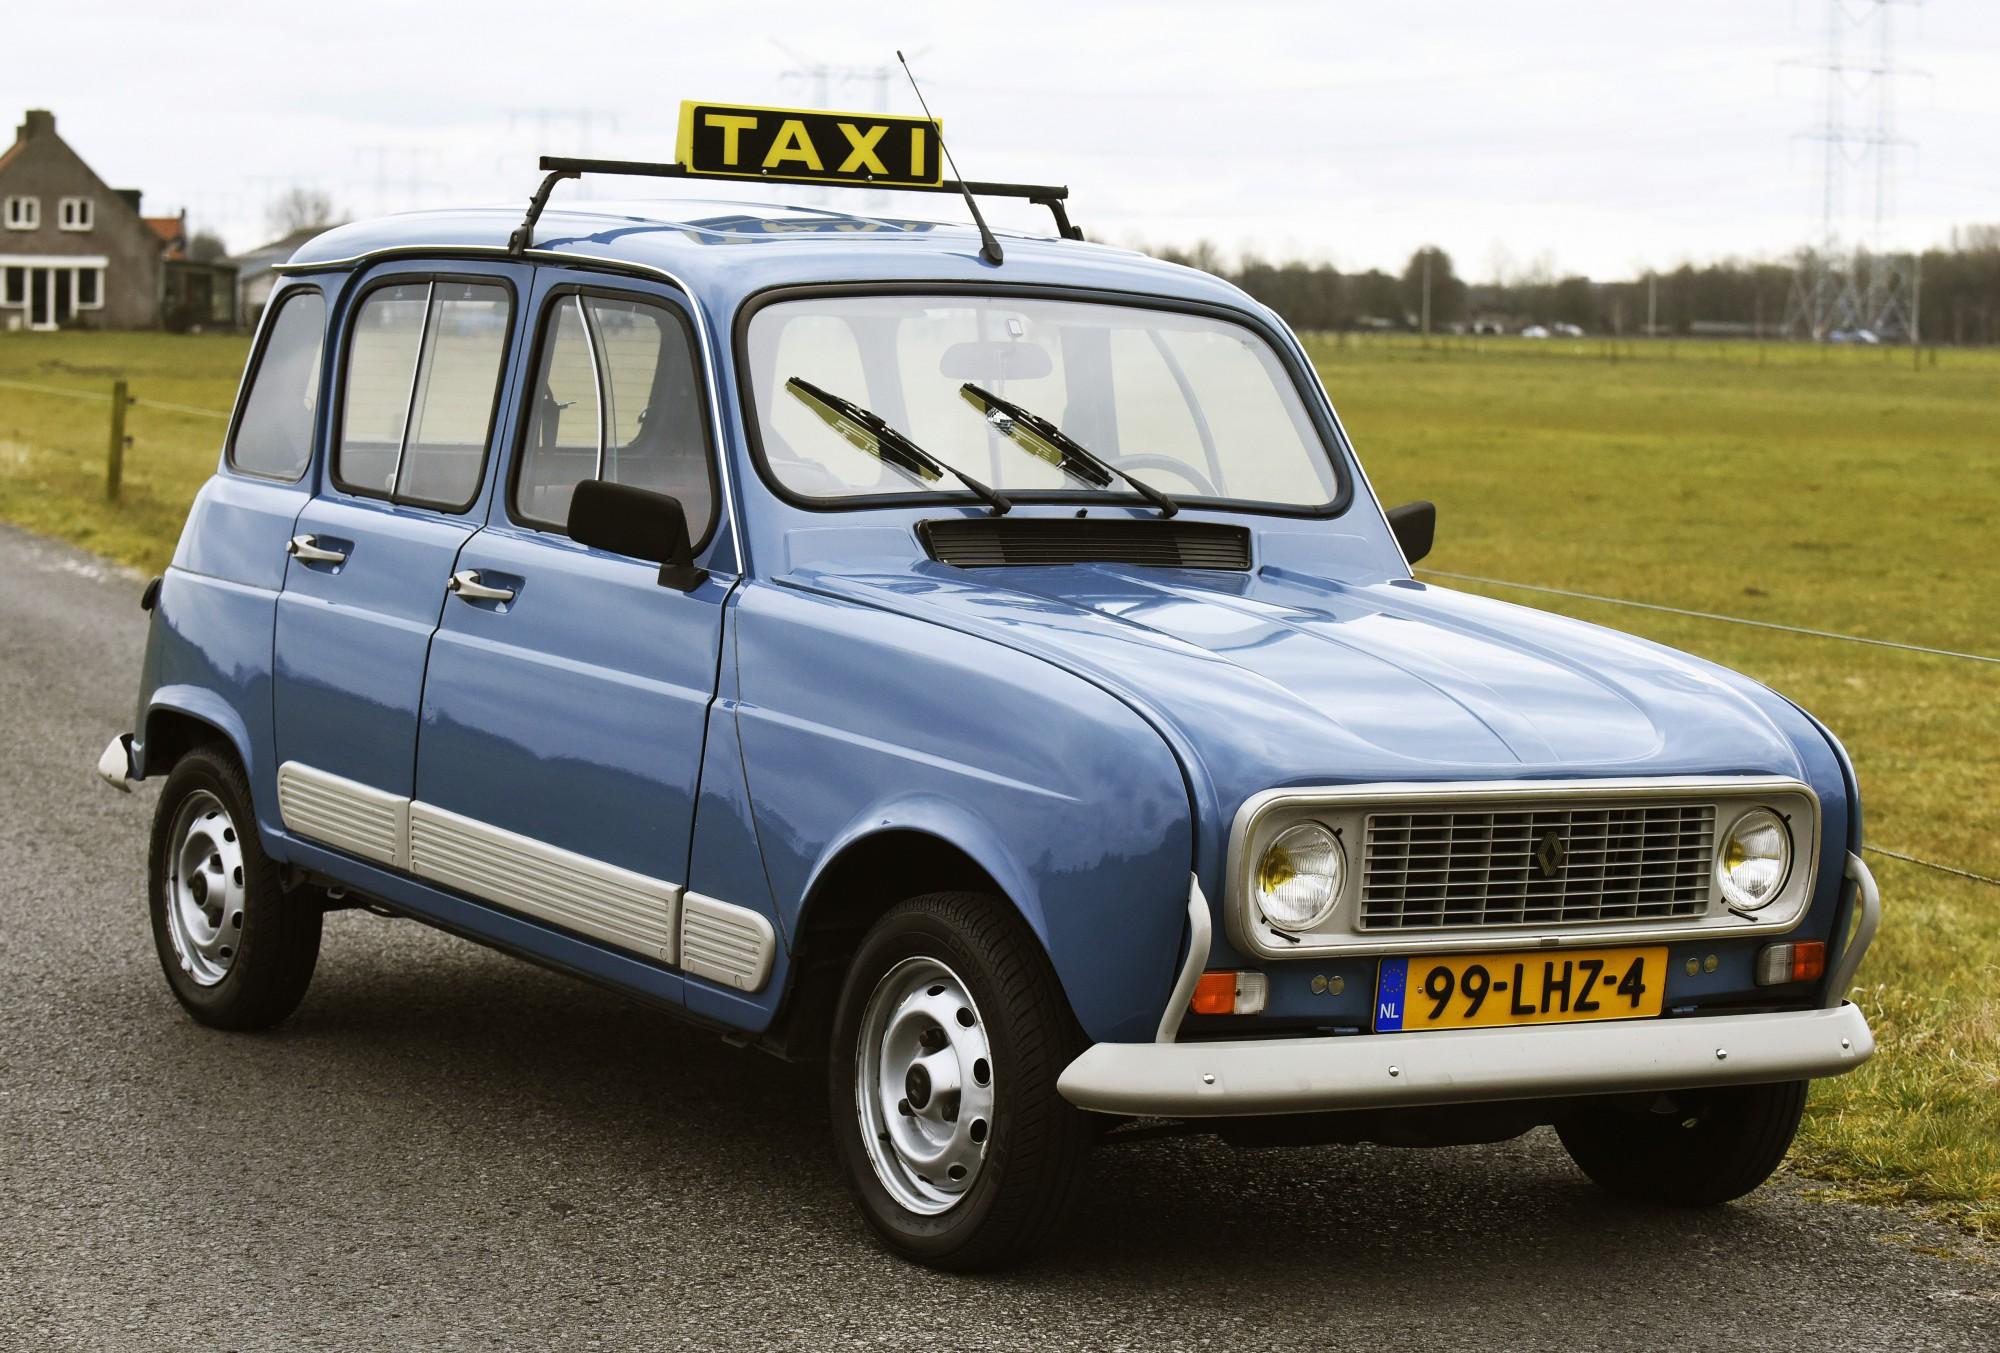 Tilburg Rik Bruggeman met de Renault 4 , 00022291A